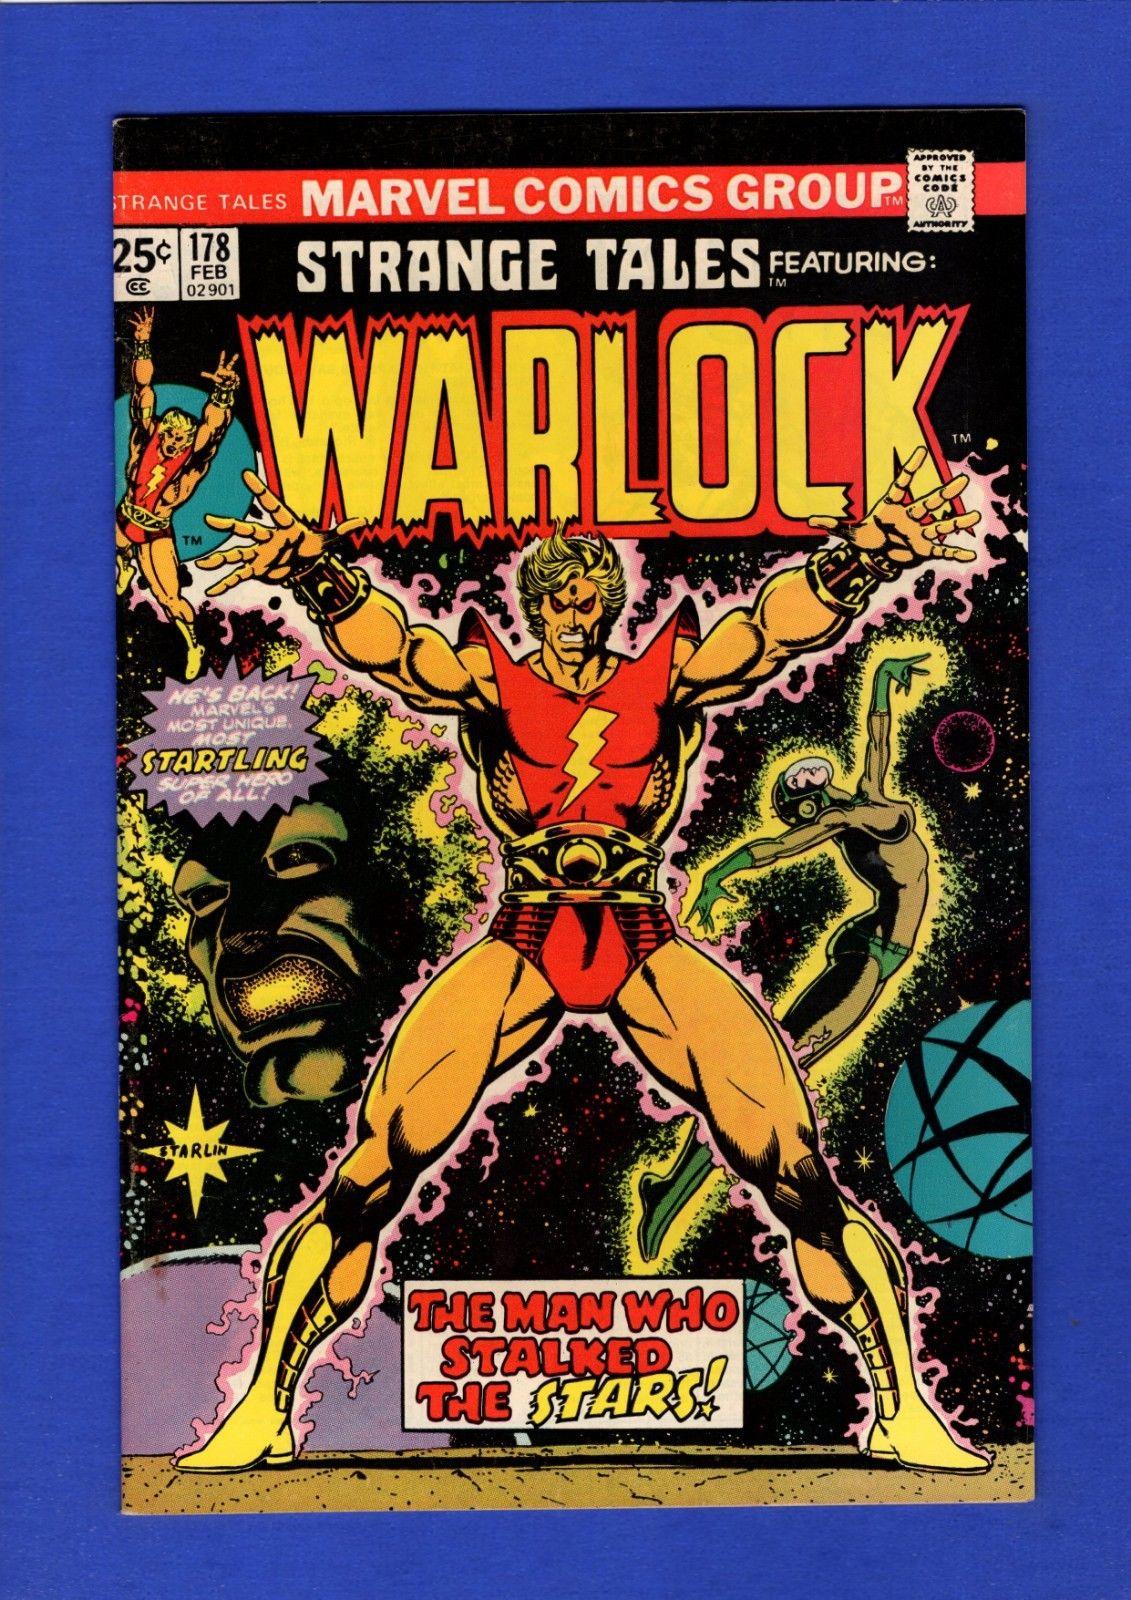 STRANGE TALES #178 WARLOCK VF+ GLOSSY HIGH GRADE BRONZE AGE MARVEL KEY